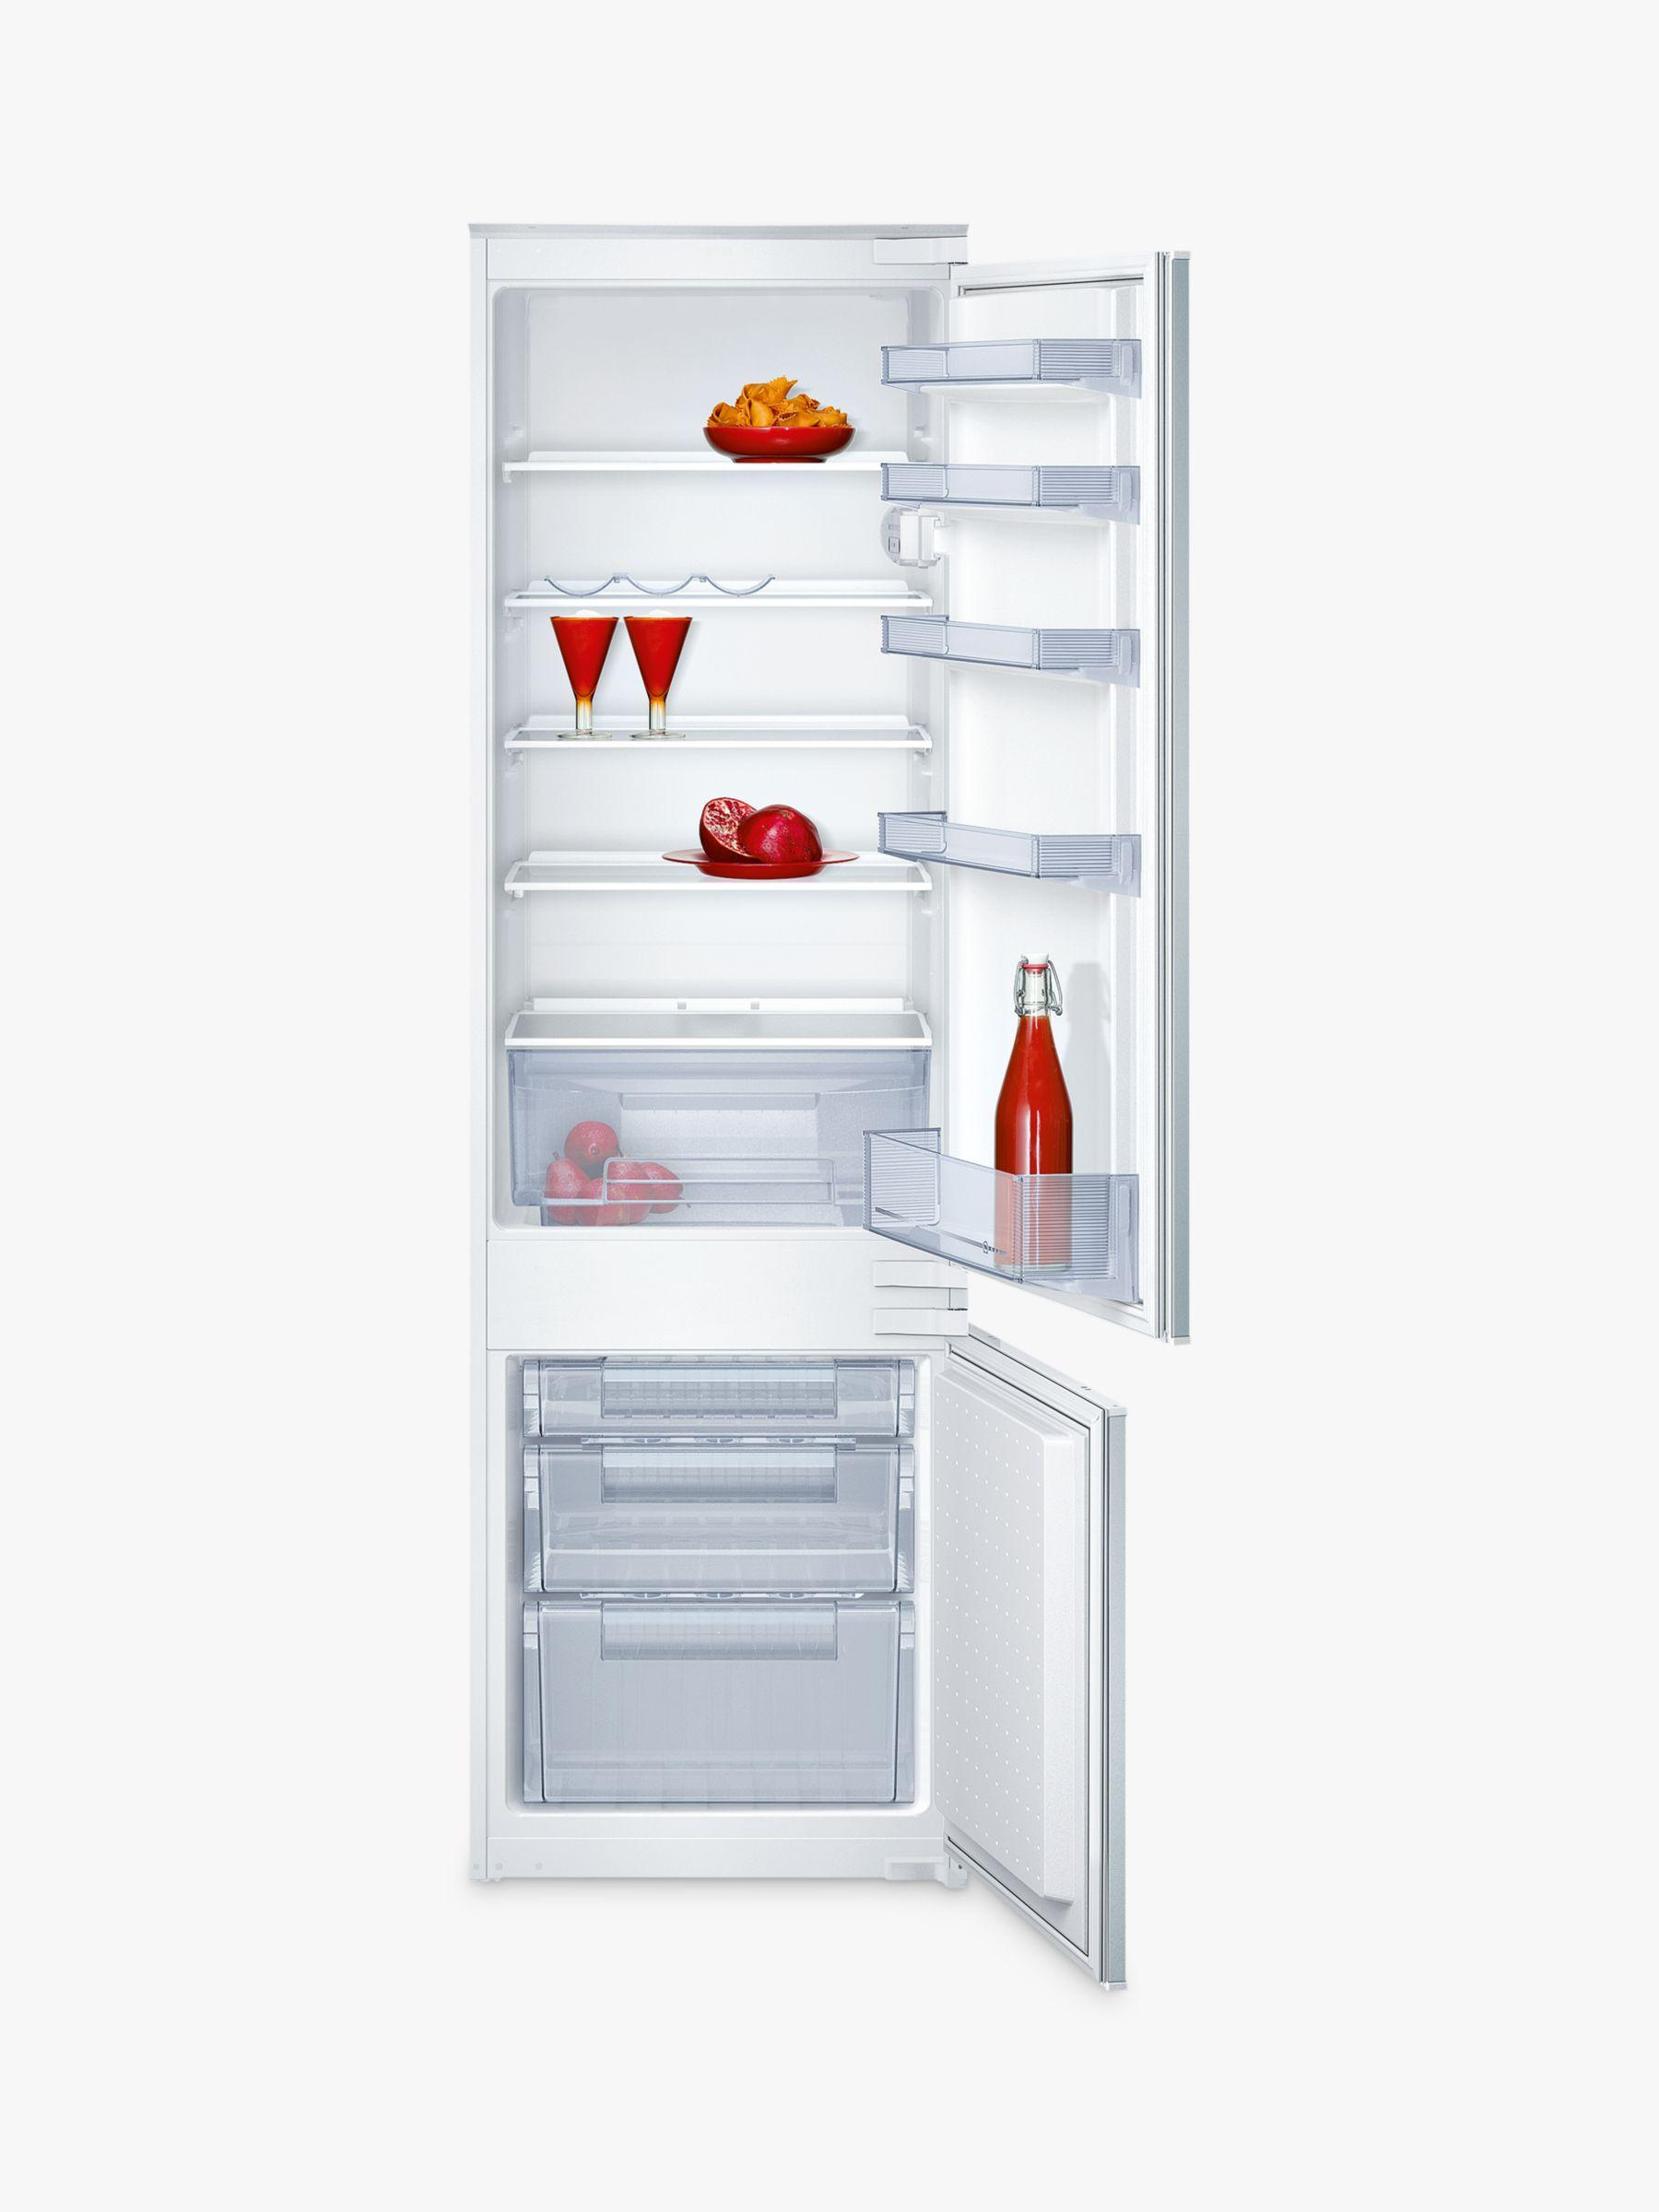 NEFF Neff K8524X8GB Integrated Fridge Freezer, A+ Energy Rating, 56cm Wide